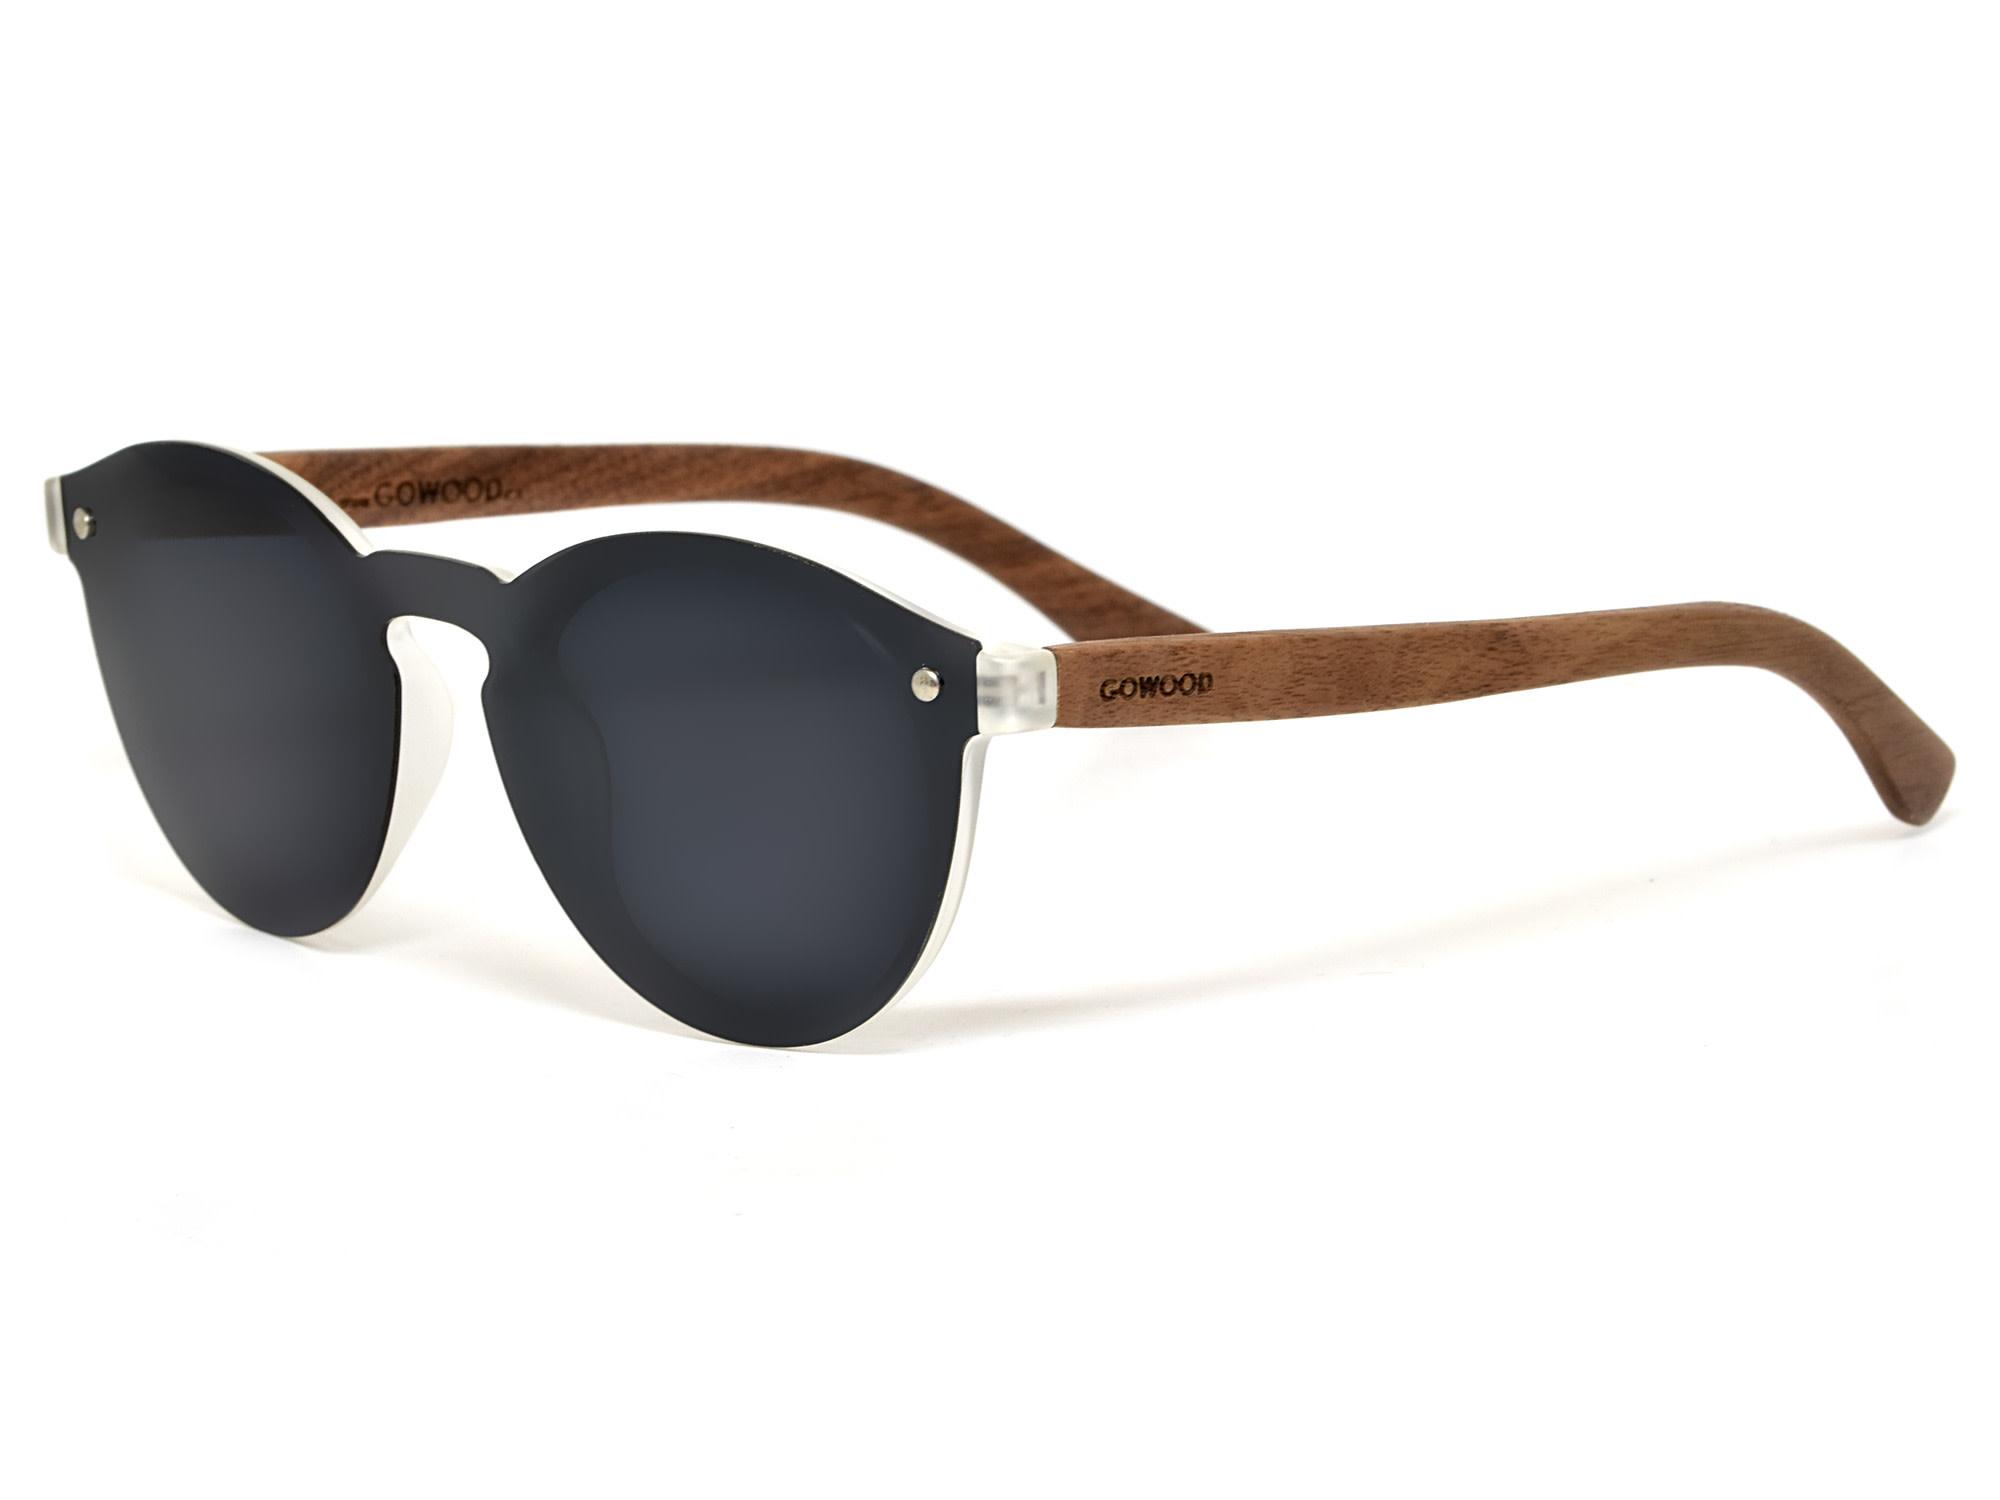 GoWood Sunglasses: Round Walnut Wood  w/Black Polarized Lenses RIO-W1-G